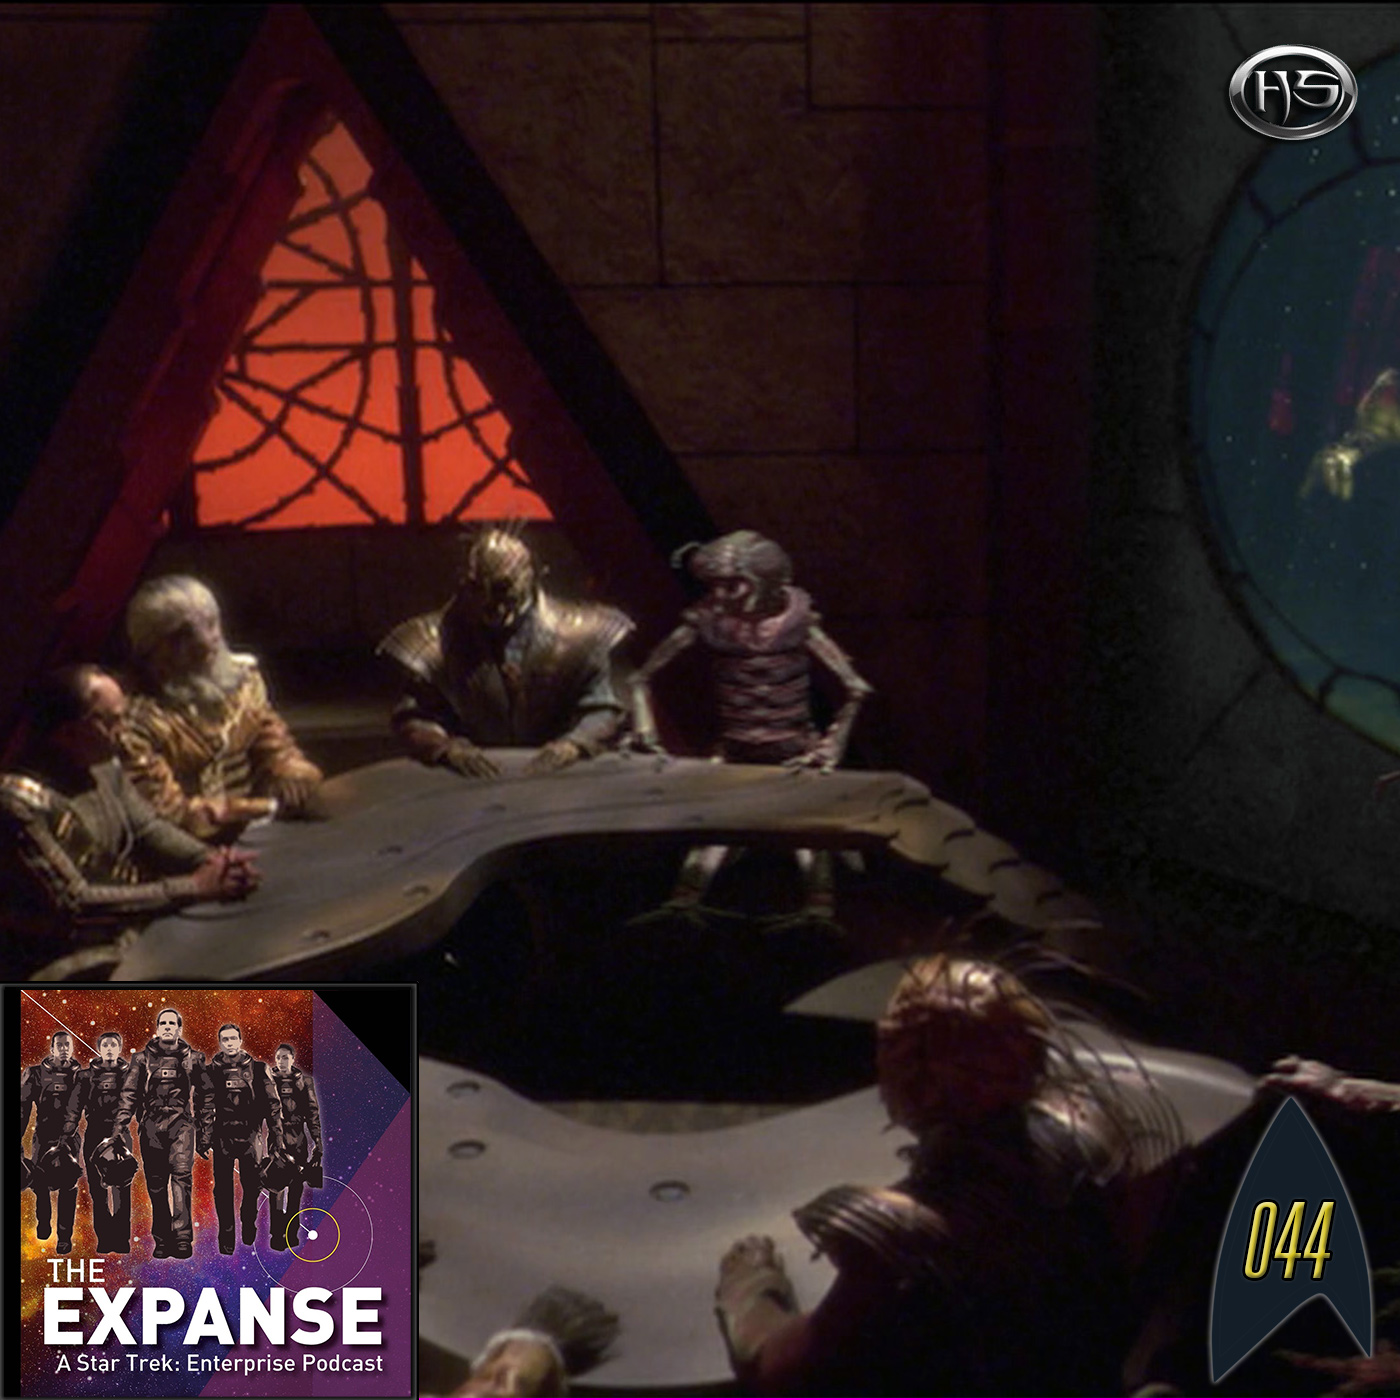 The Expanse Episode 44